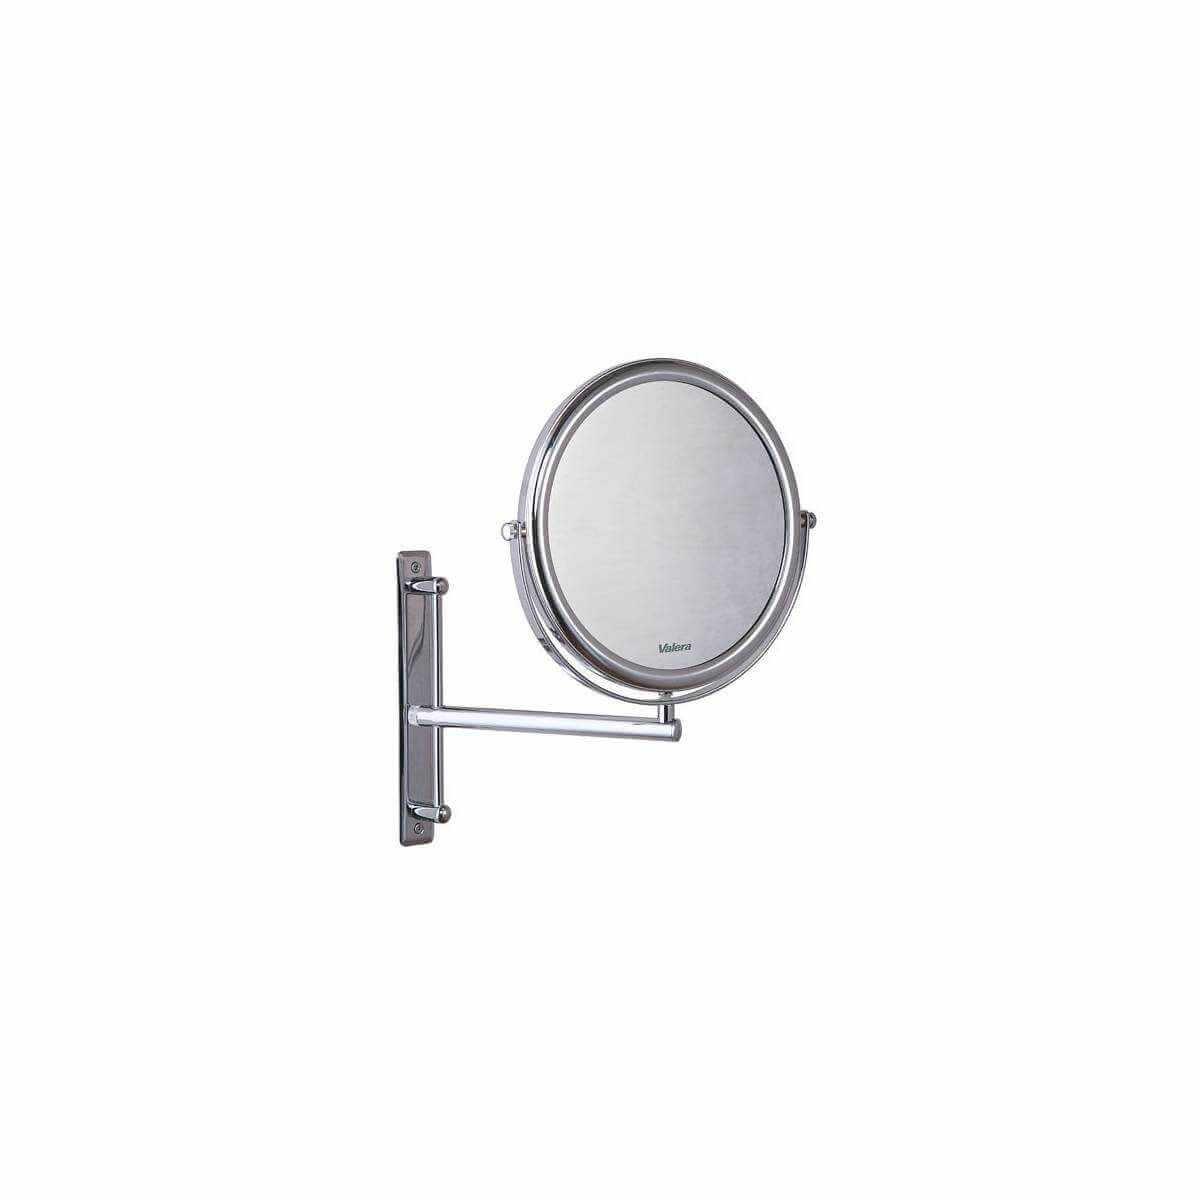 Зеркало с кронштейном Valera OPTIMA Bar 207.00 Valera